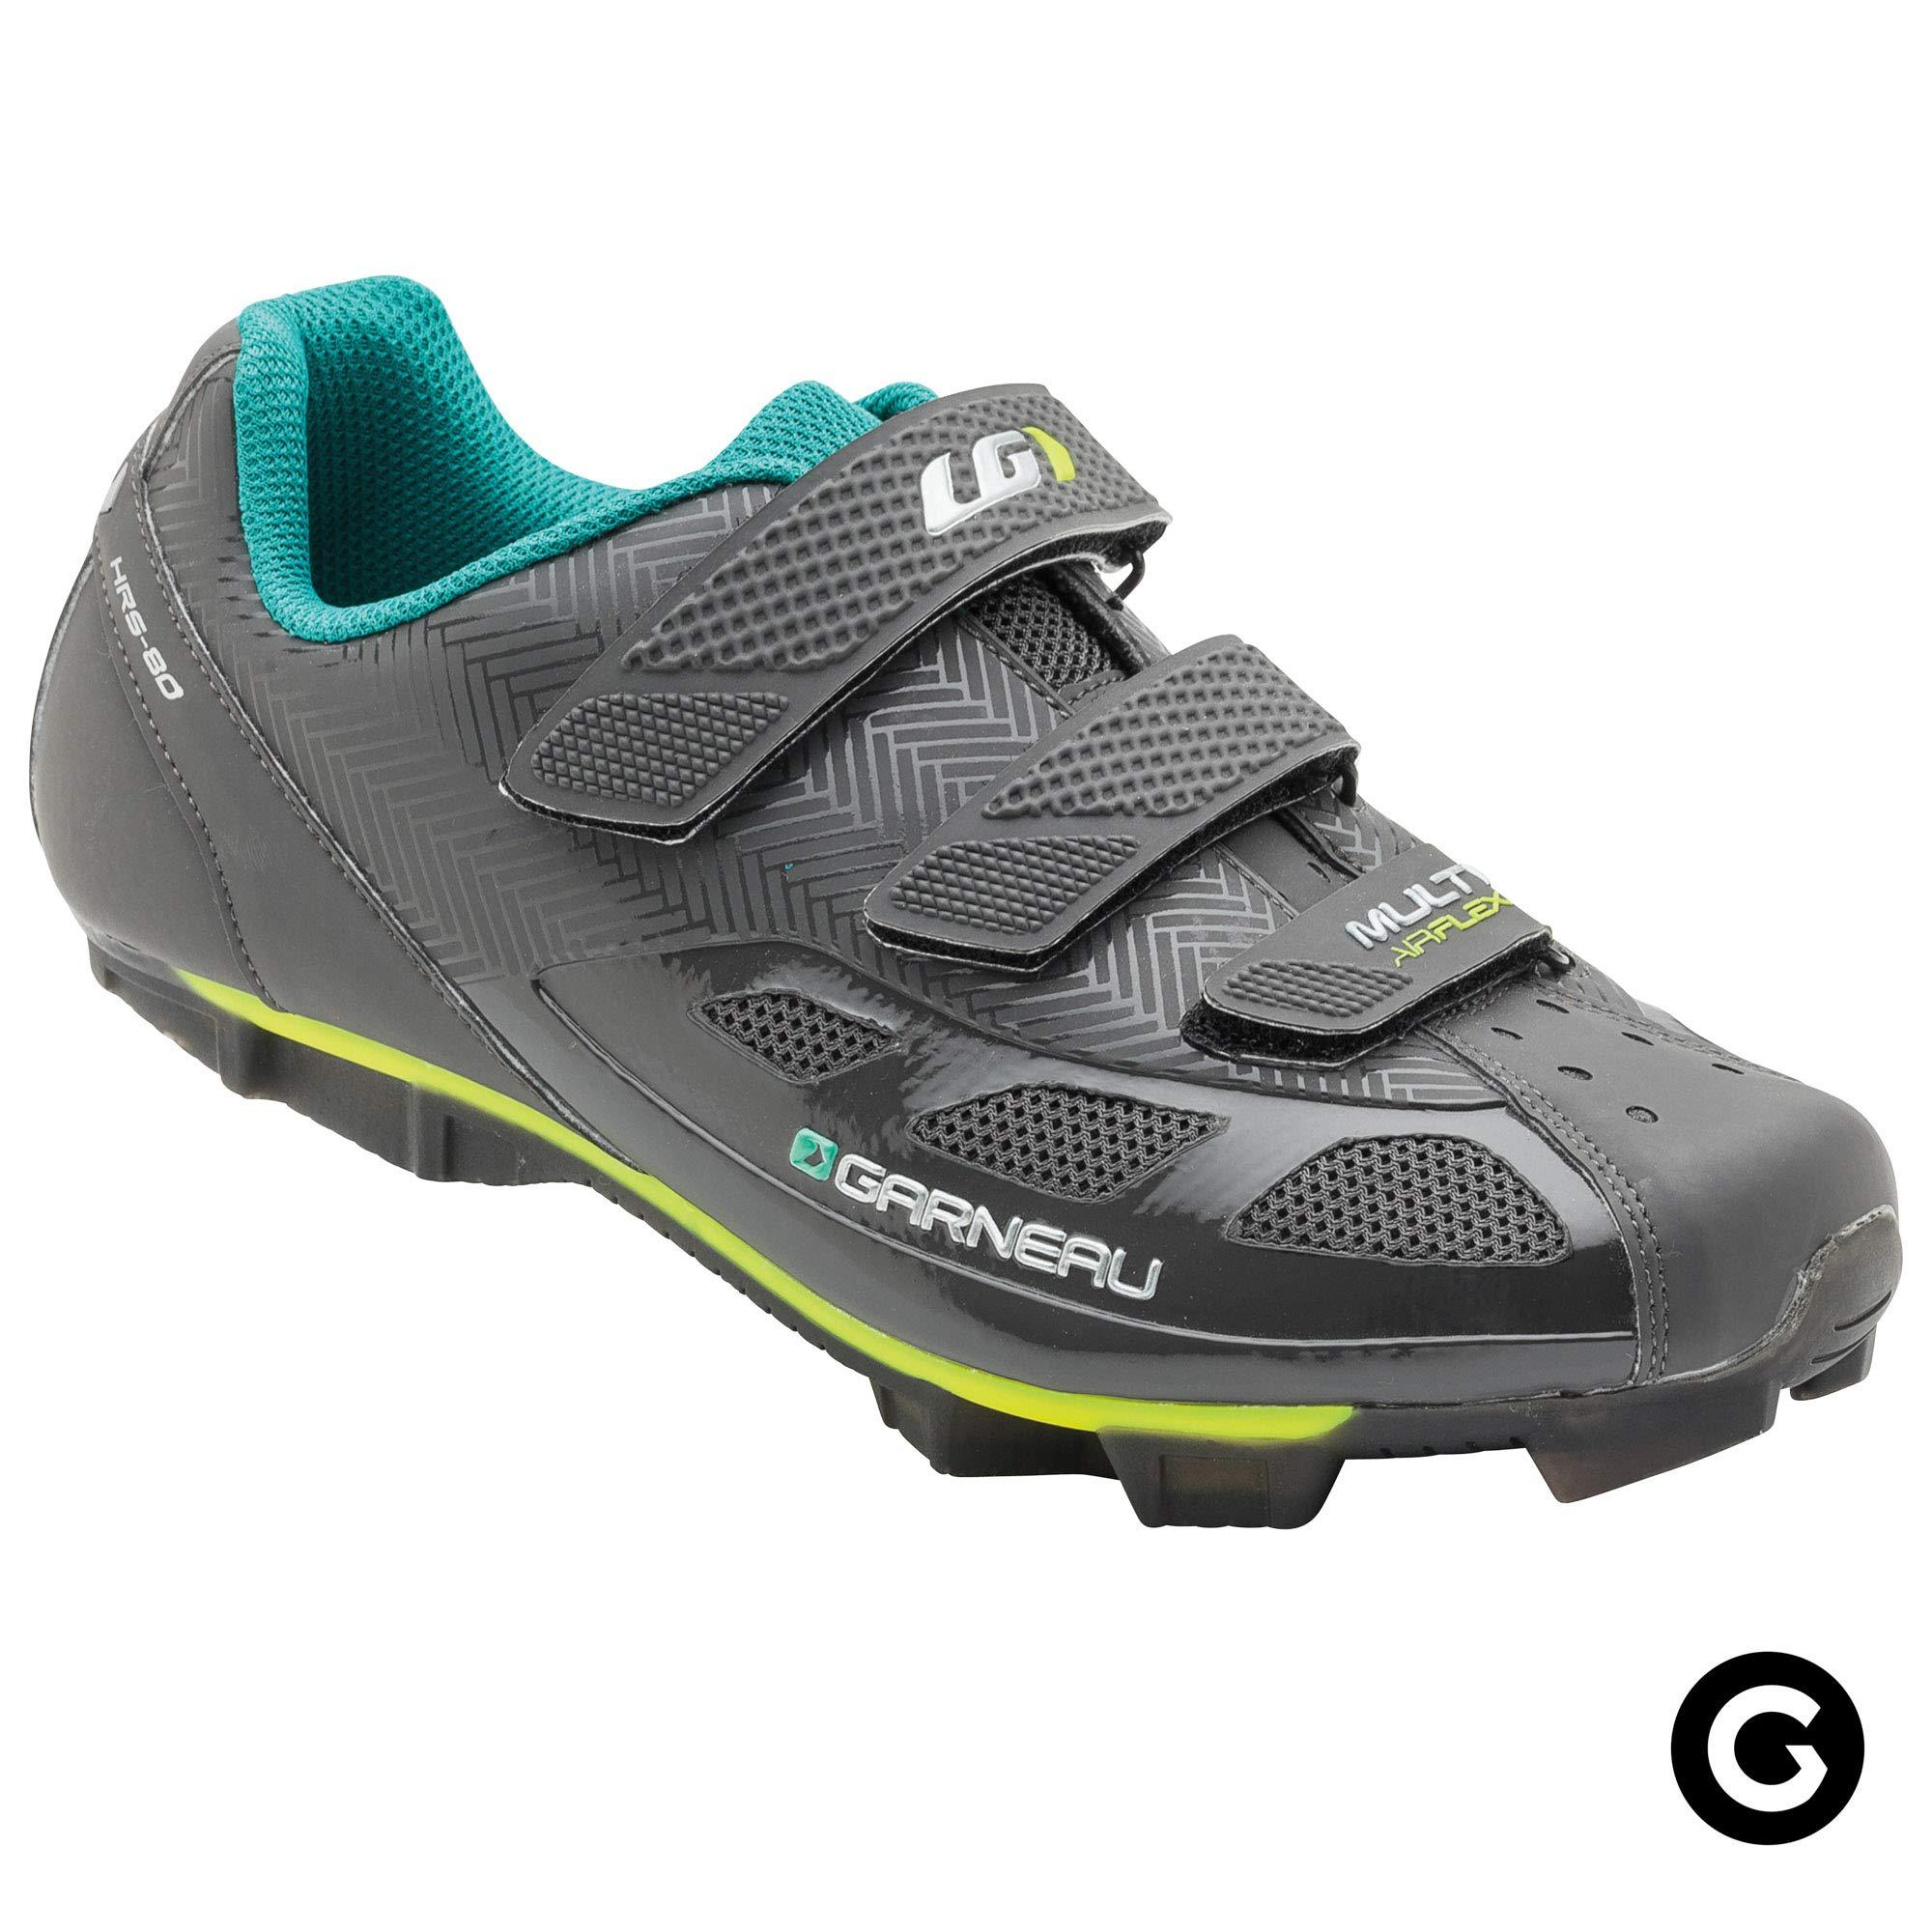 Louis Garneau Women's Multi Air Flex Bike Shoes for Indoor Cycling, Commuting and MTB, SPD Cleats Compatible with MTB Pedals, Asphalt, US (6), EU (36)